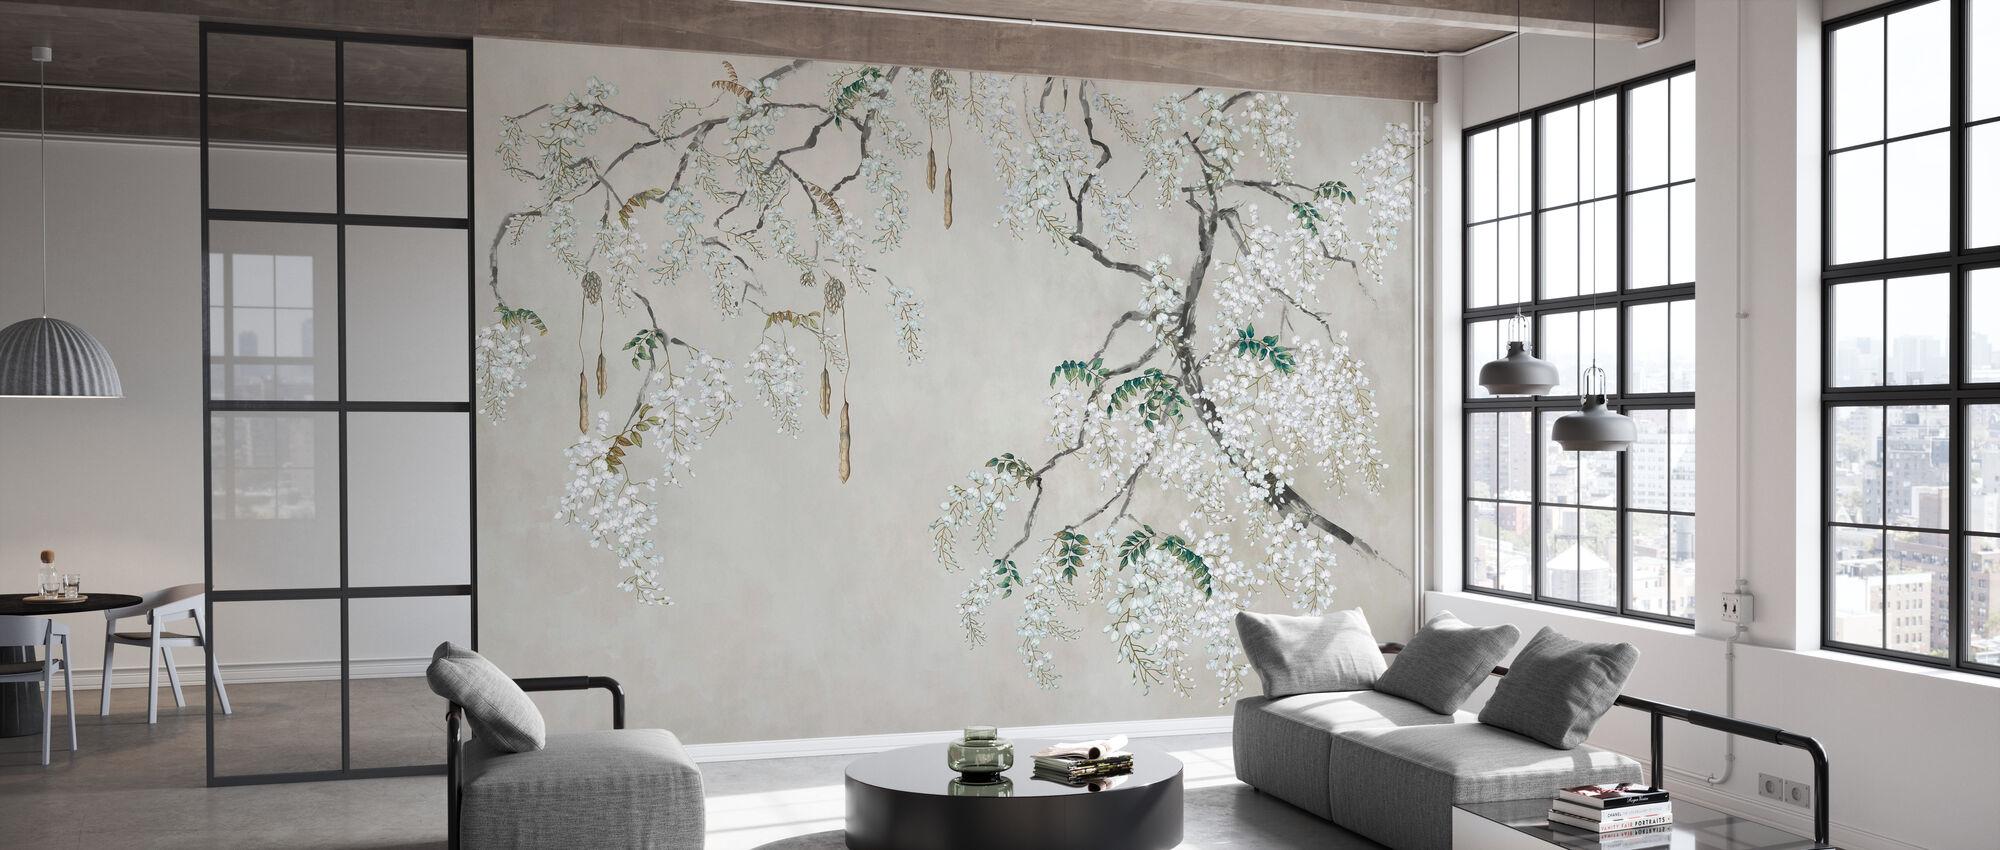 Blossom Wisteria II - Wallpaper - Office